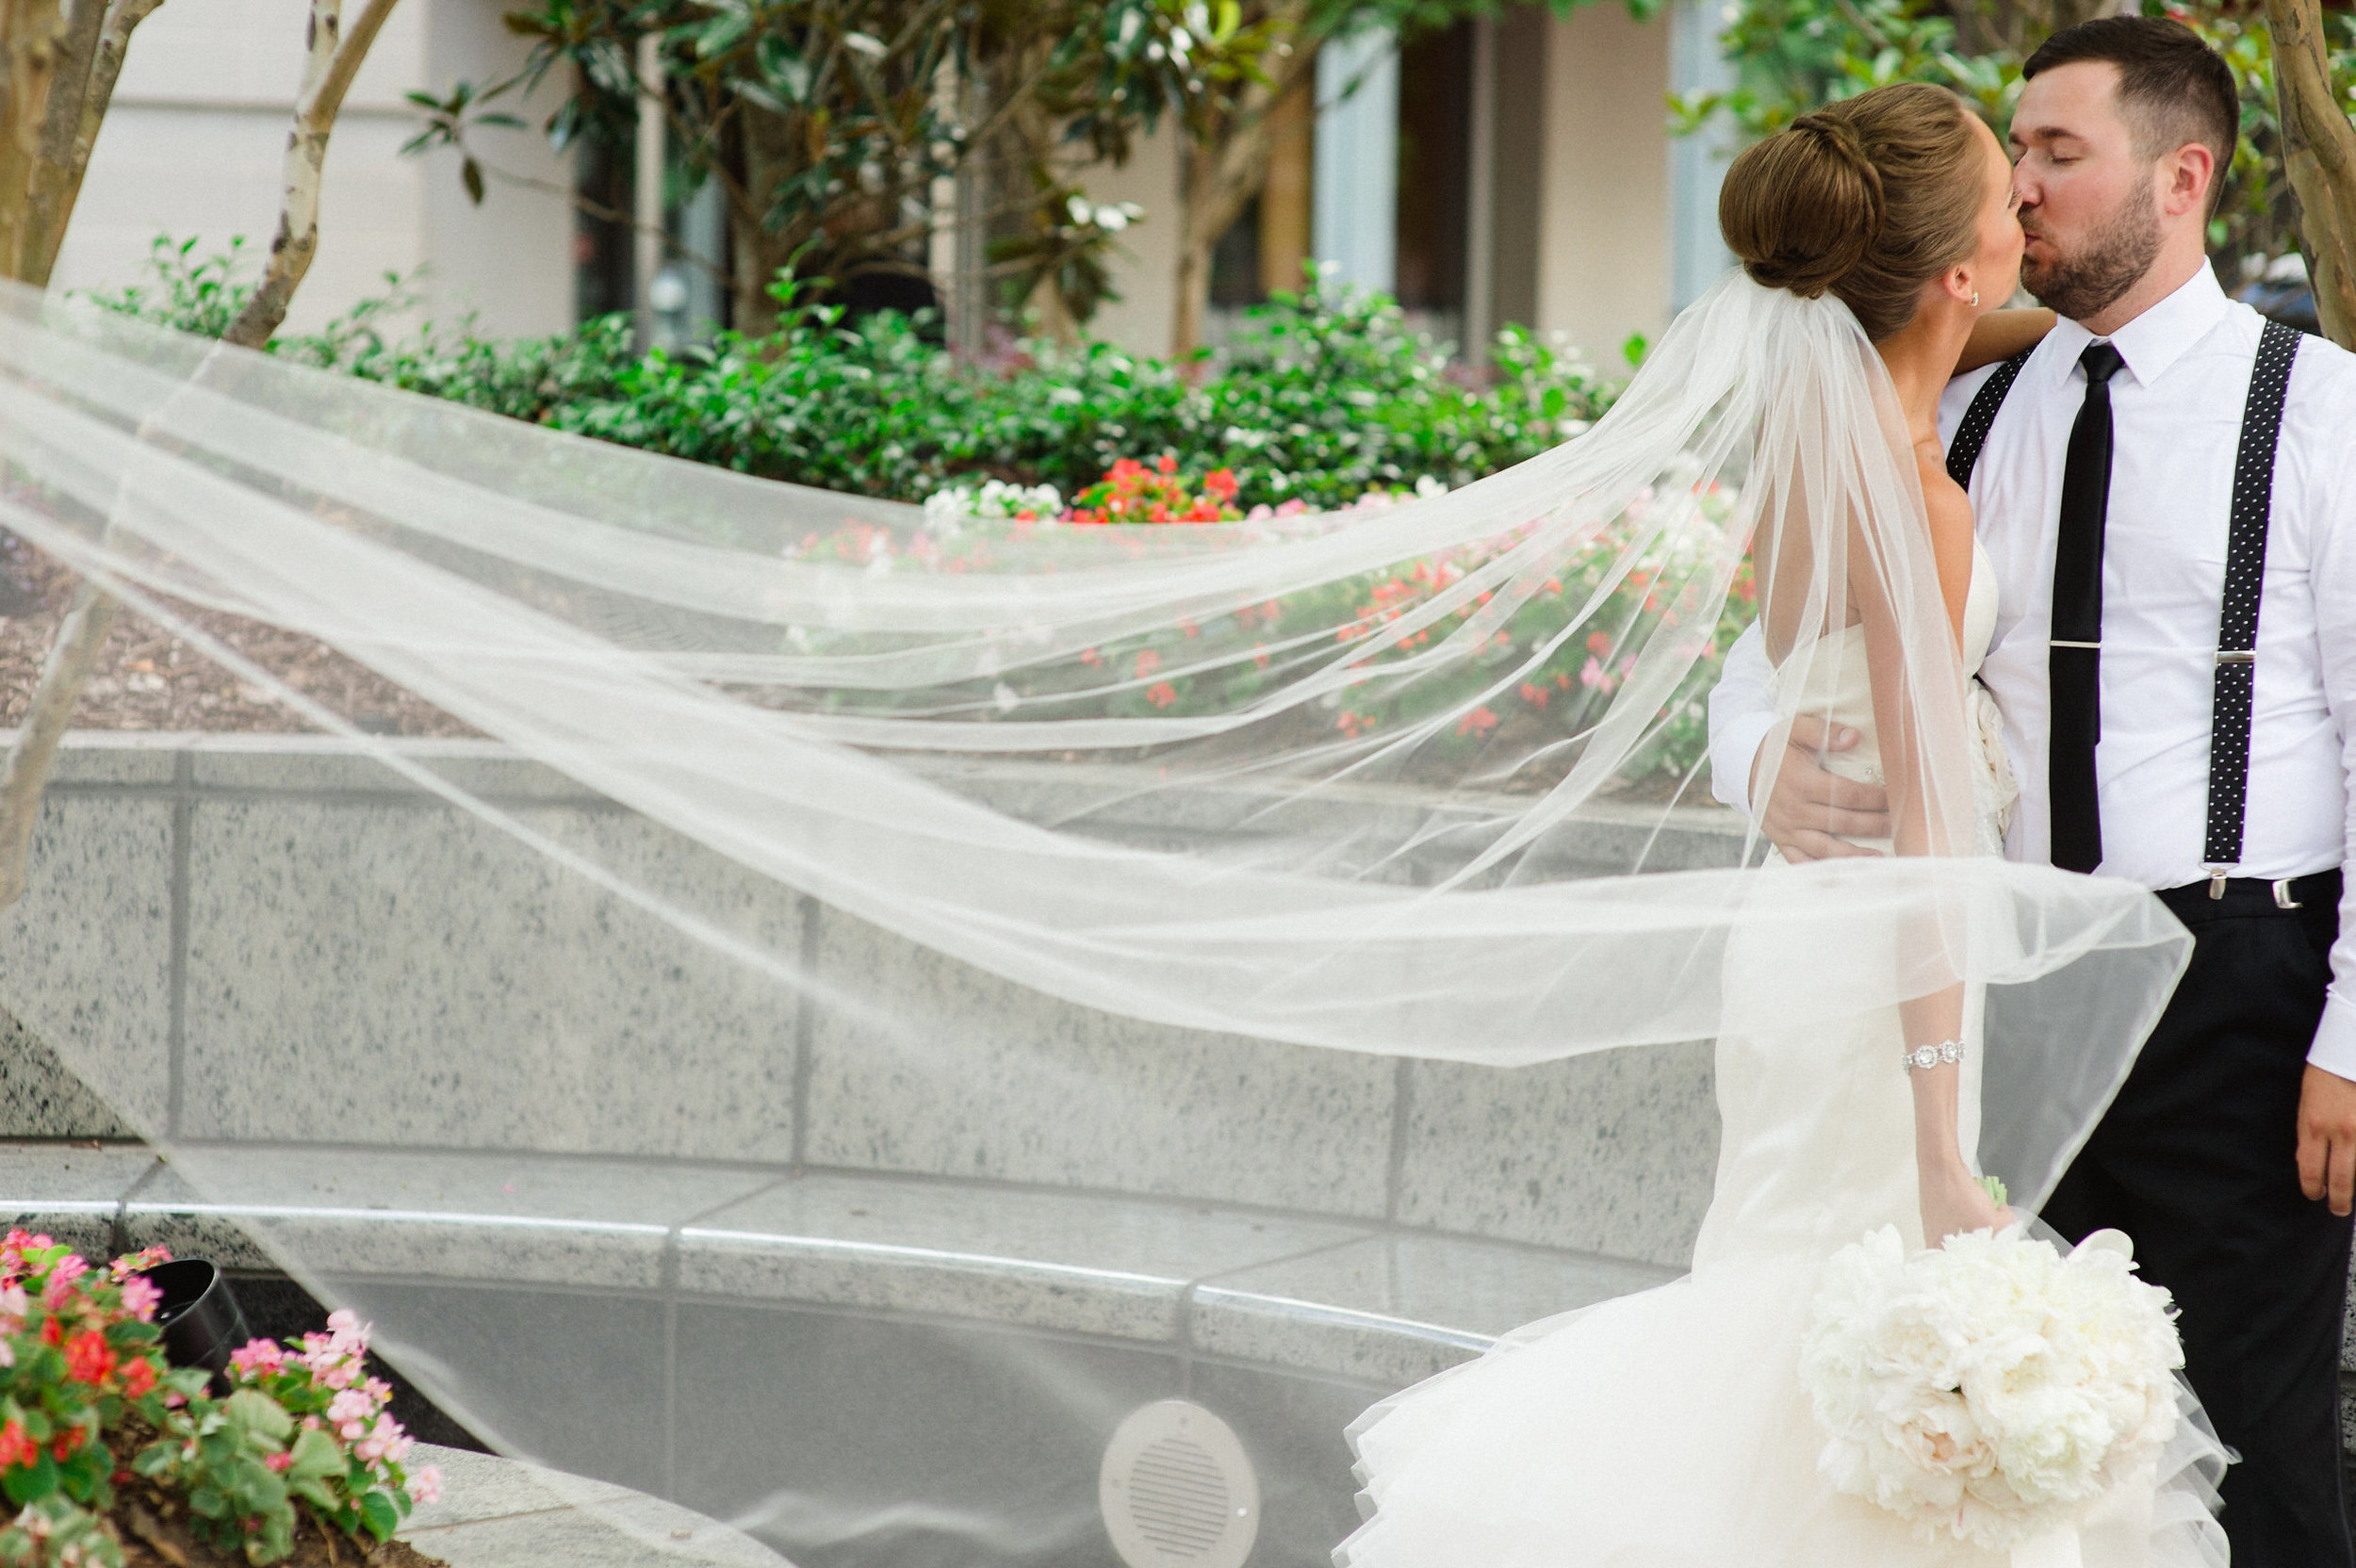 shelby&jordan|smitten&hooked|wedding|groups-126.jpg